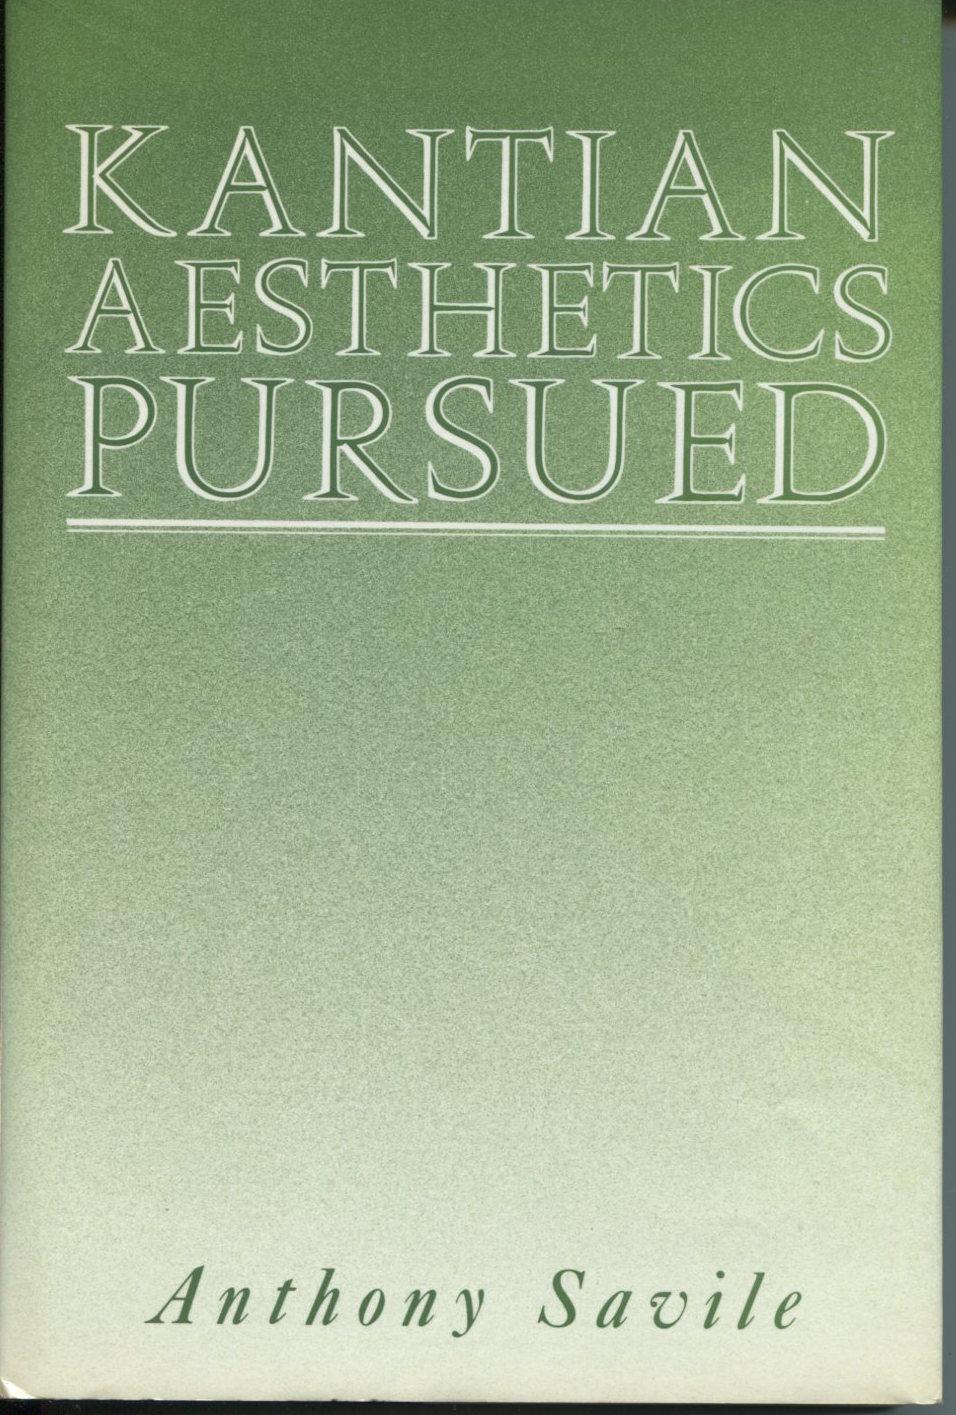 Kantian Aesthetics Pursued.